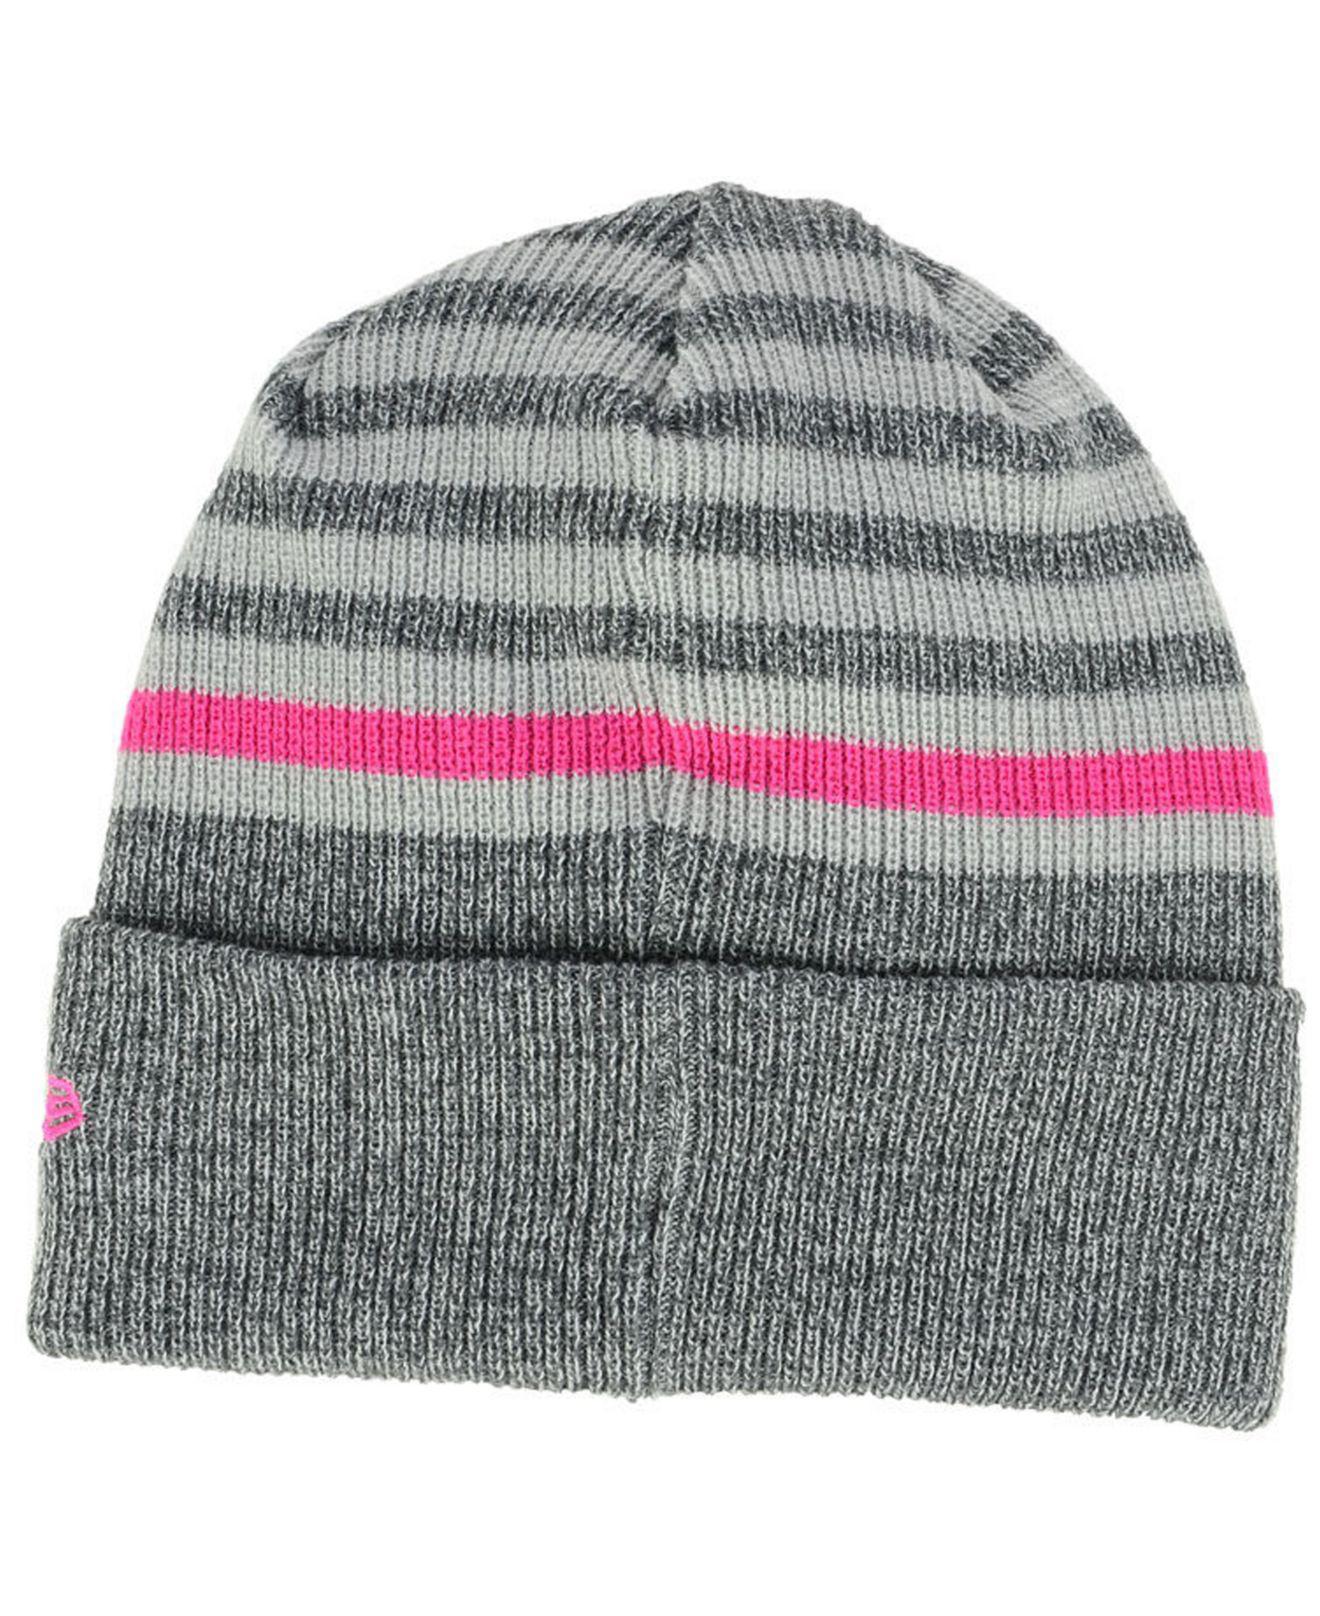 differently 1689c 8a865 ... shopping lyst ktz dallas mavericks striped cuff knit hat in gray 0432d  348a0 ...